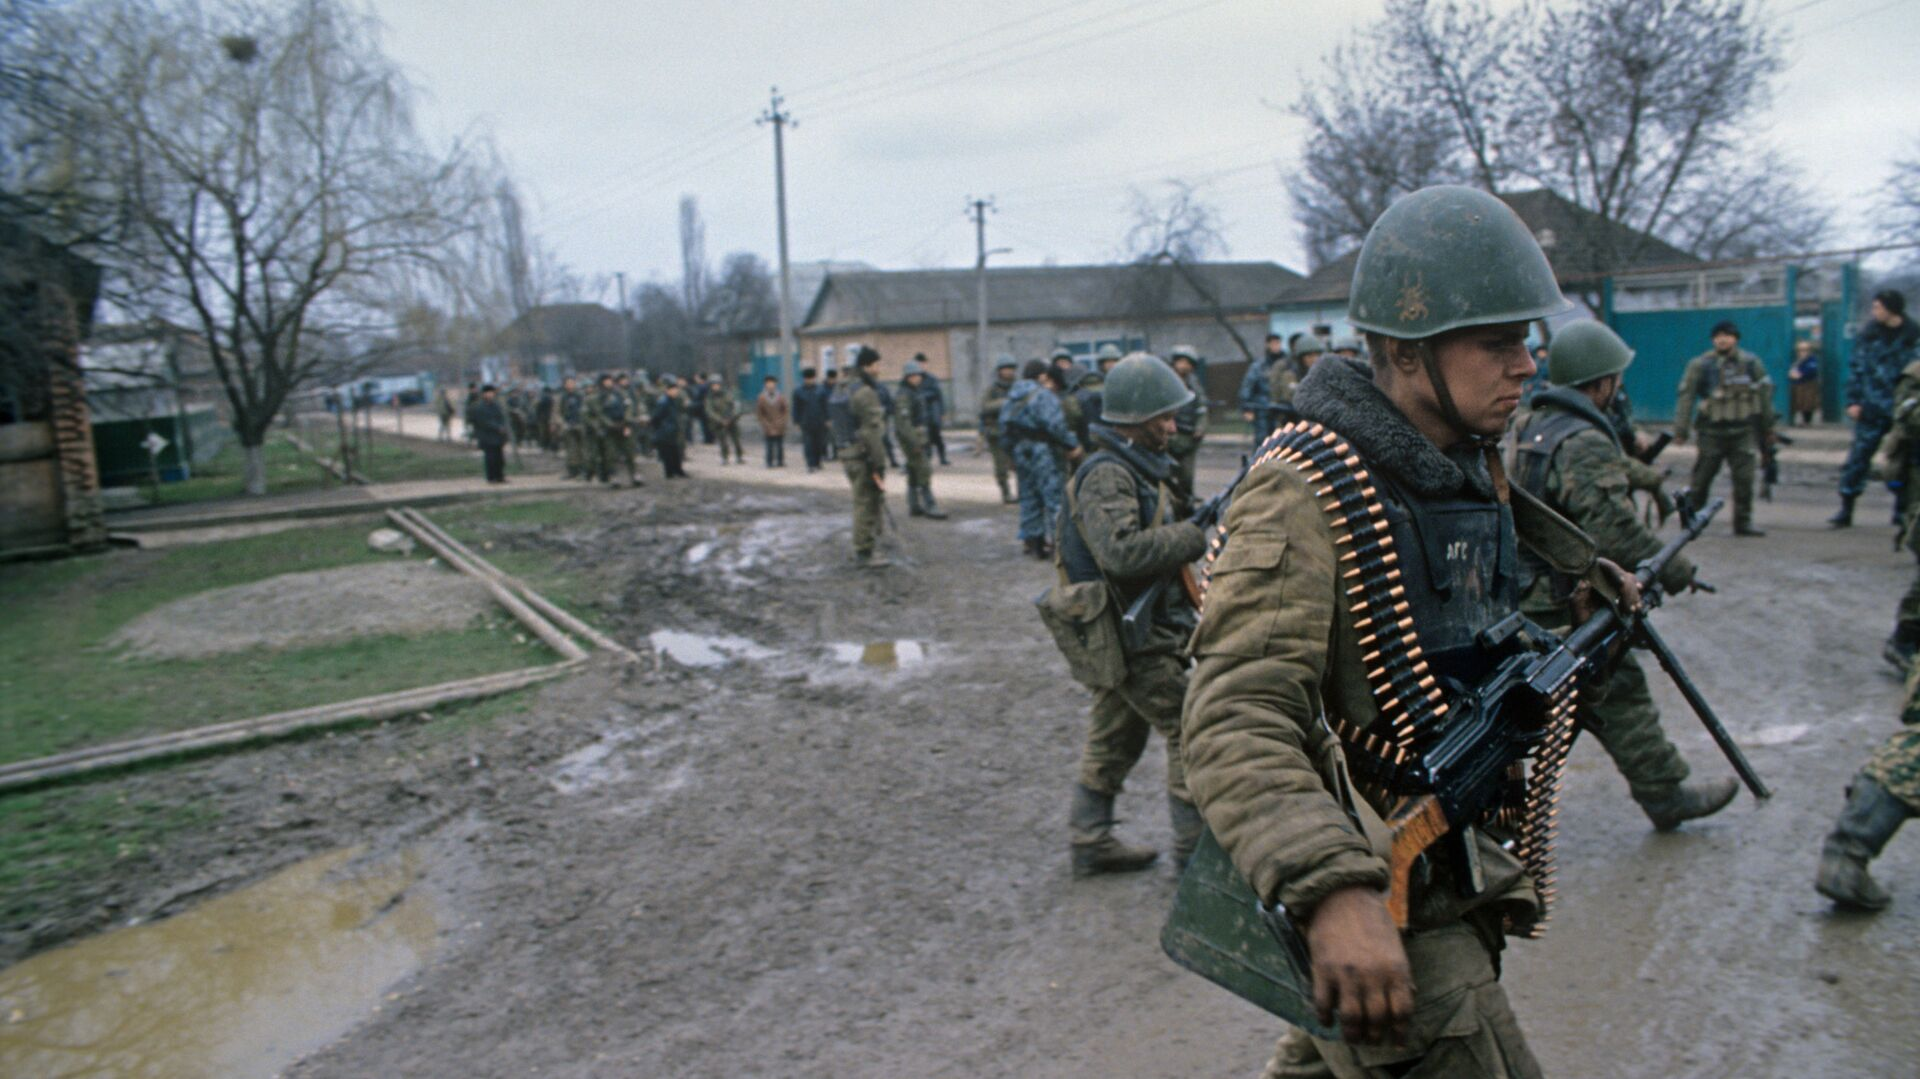 Soldados rusos en Chechenia - Sputnik Mundo, 1920, 18.02.2021